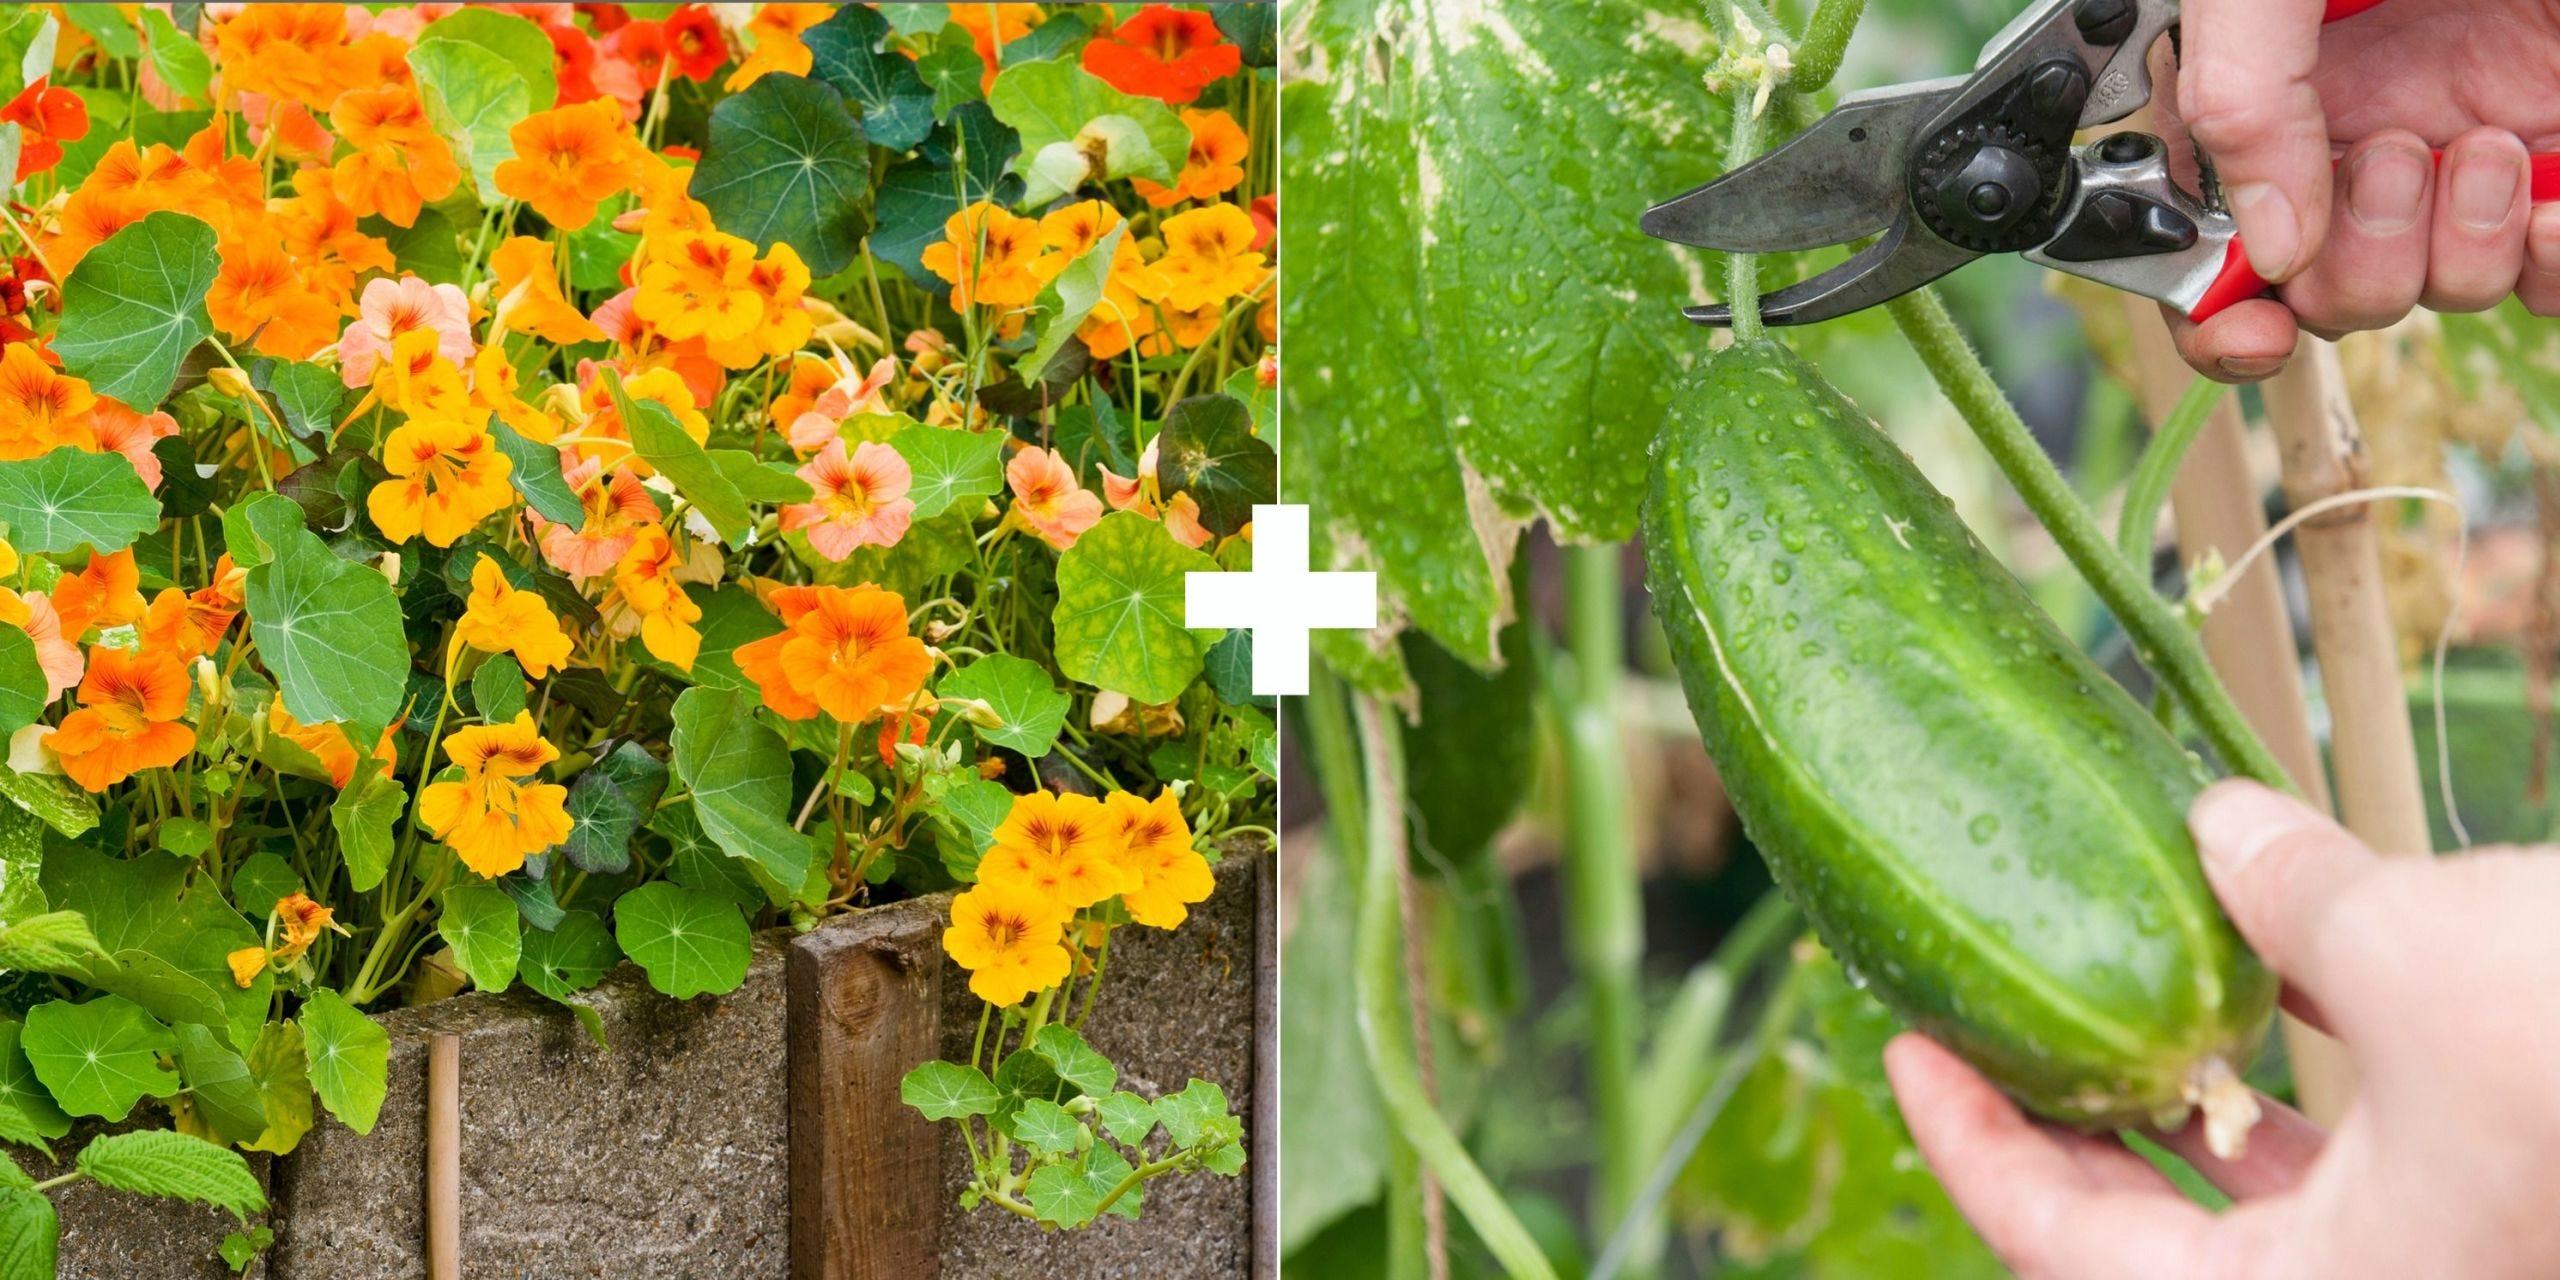 Flower, Plant, Leaf, Flowering plant, Vegetable, Cucumis, Cucumber, Lantana, Impatiens, Annual plant,